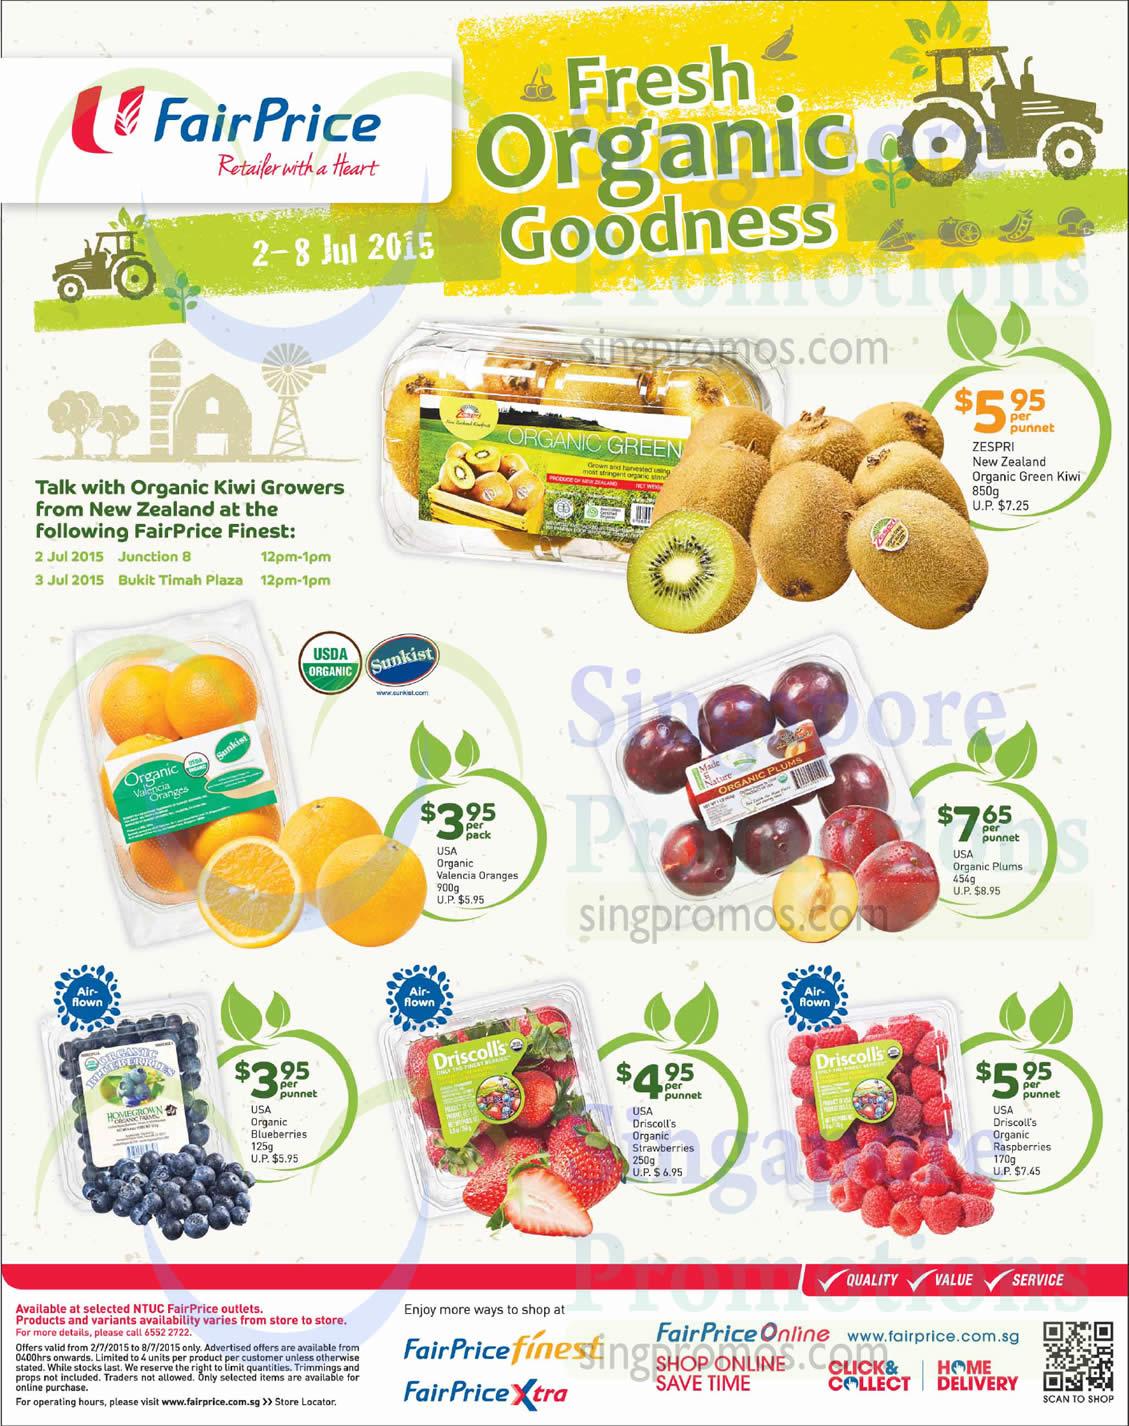 Organic Goodness Kiwi, Oranges, Plums, Blueberries, Strawberries, Raspberries